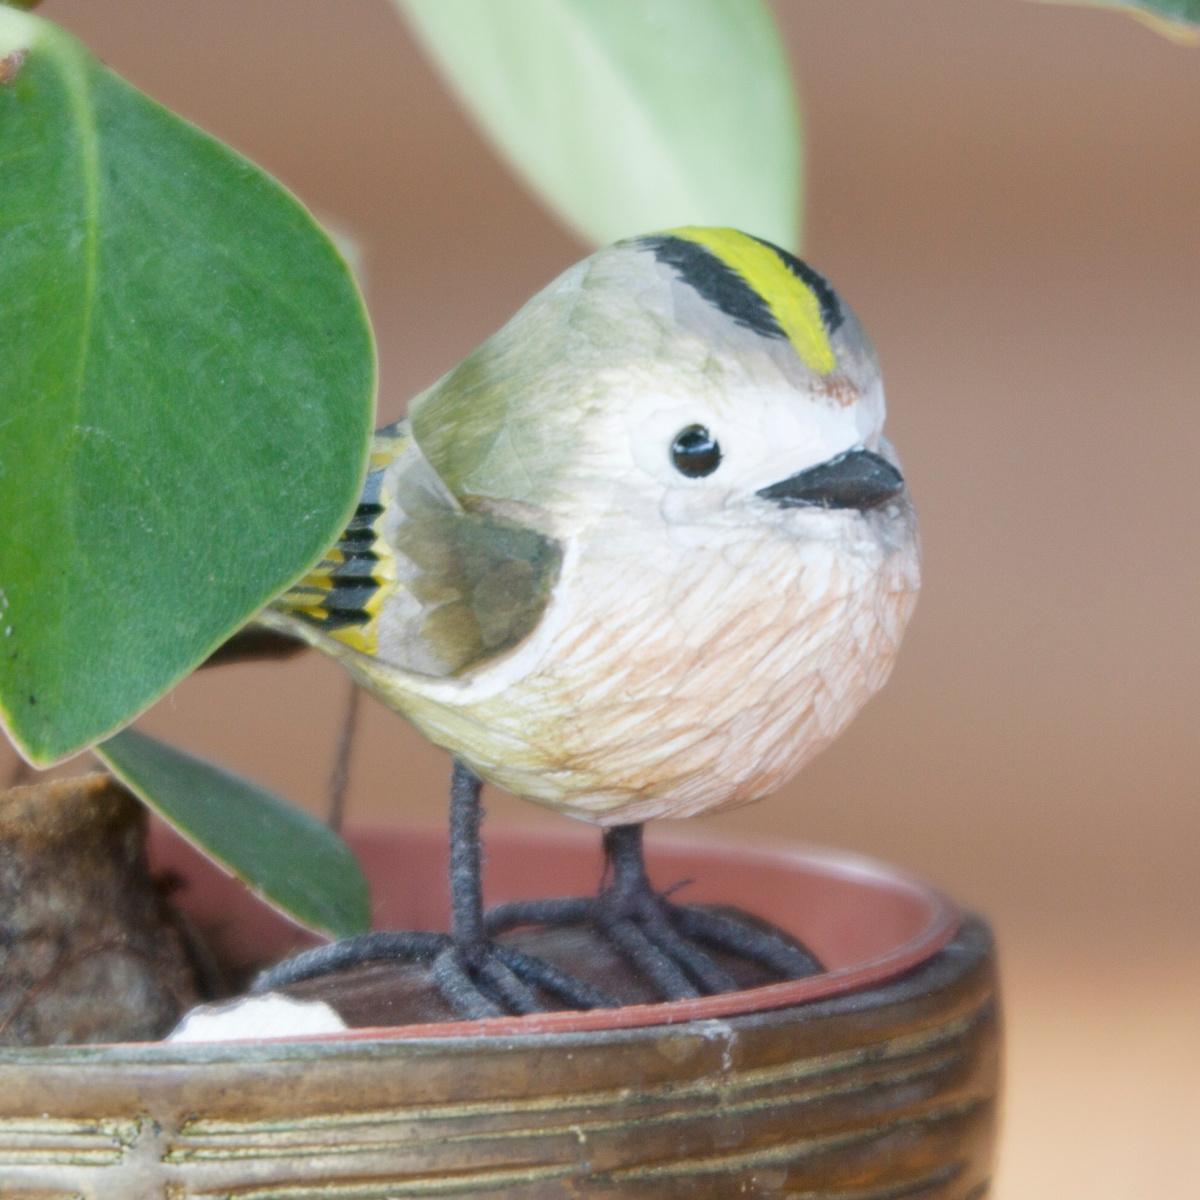 Wildlife Garden træfugl - fuglekonge